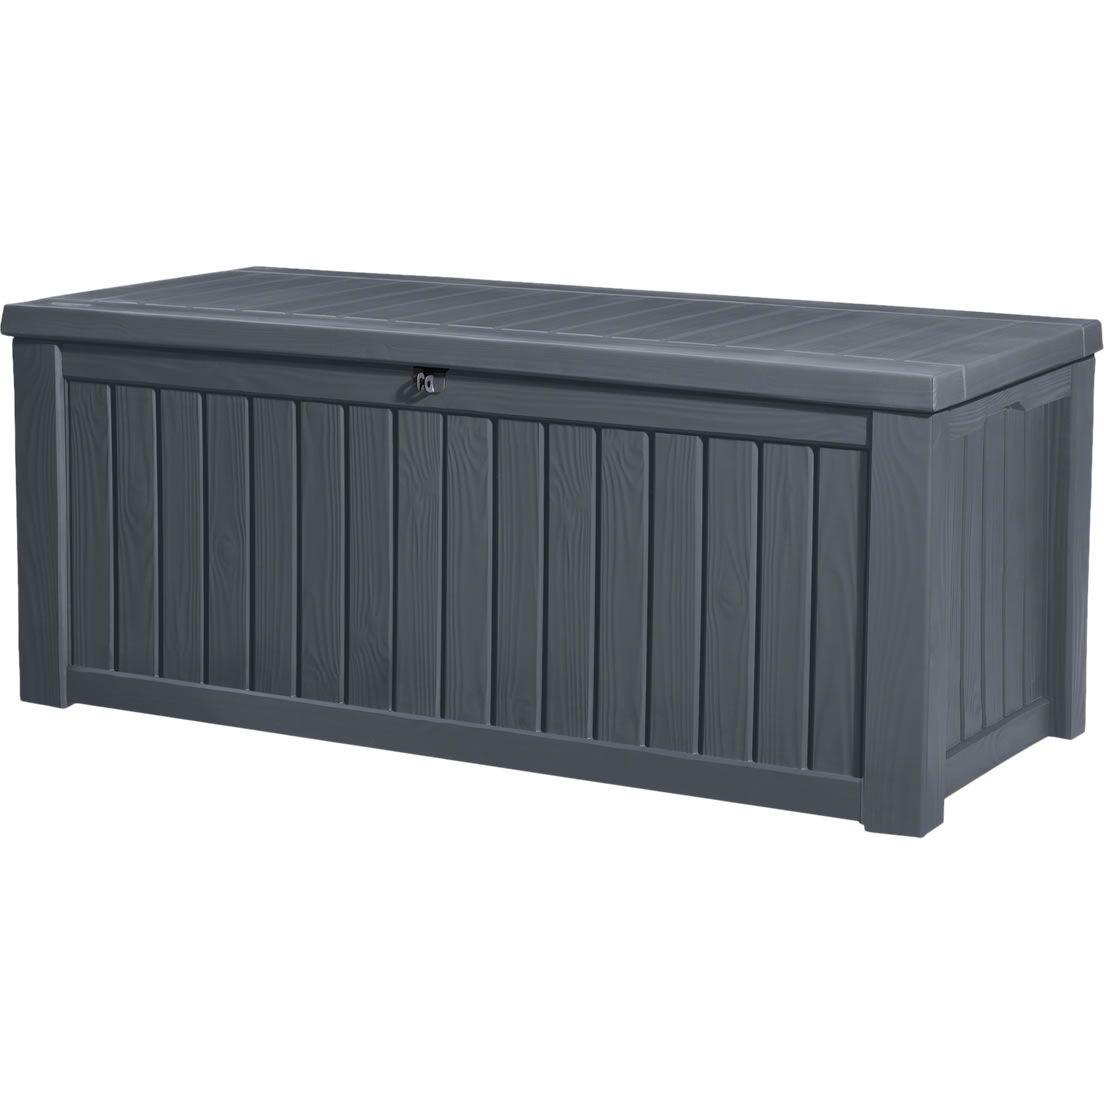 Keter rockwood storage box anthracite outdoor storage